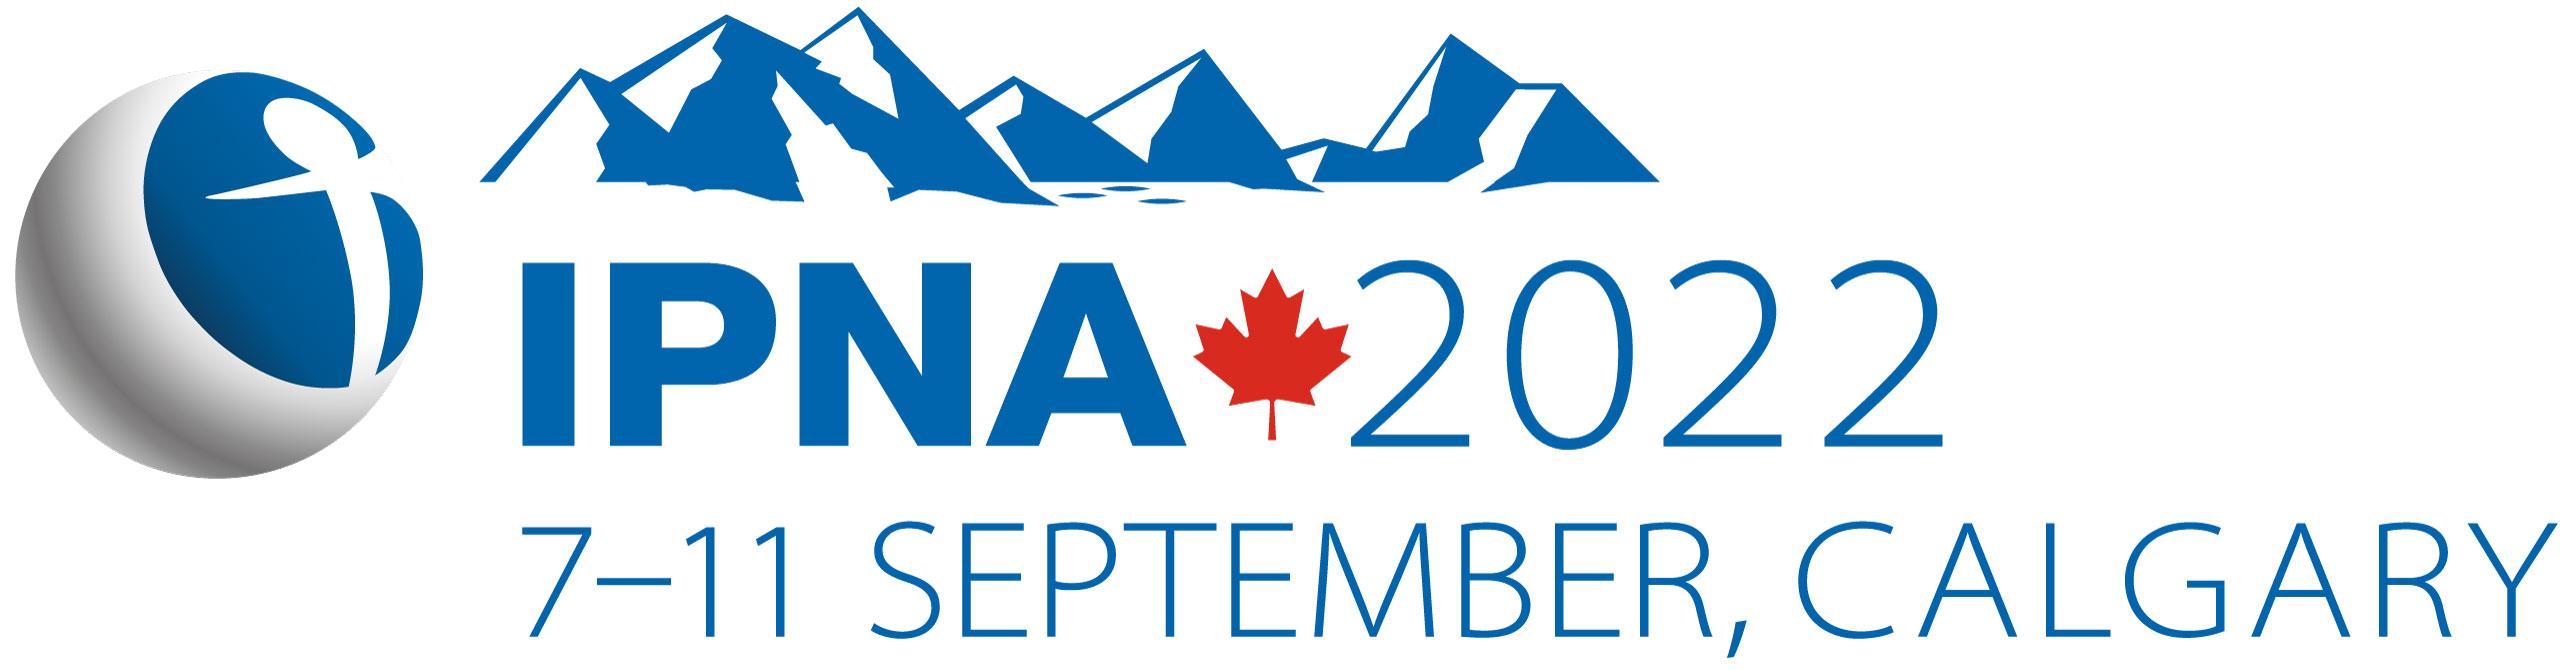 19th IPNA Congress